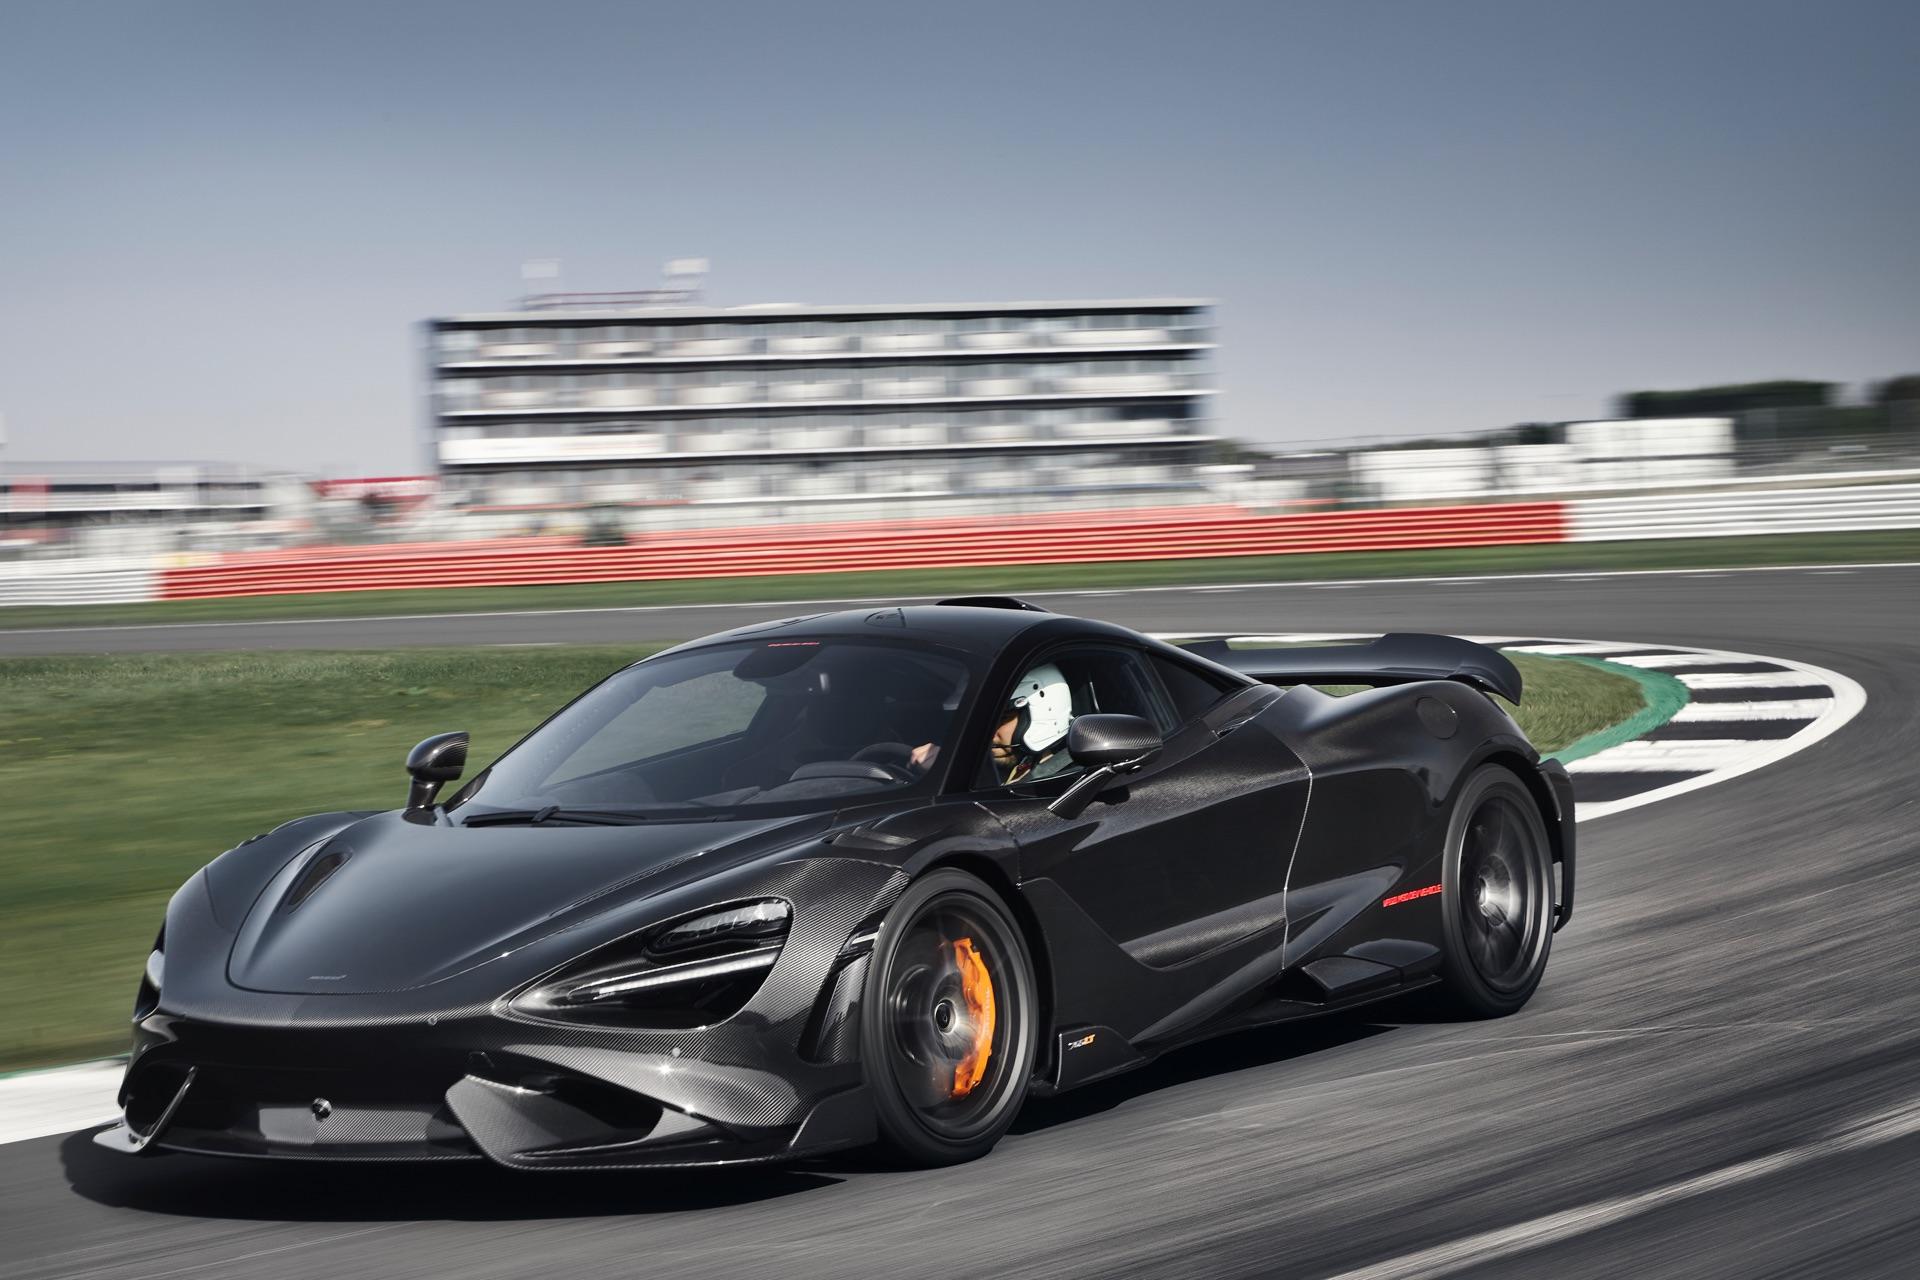 MSO McLaren 765LT Geohex Track